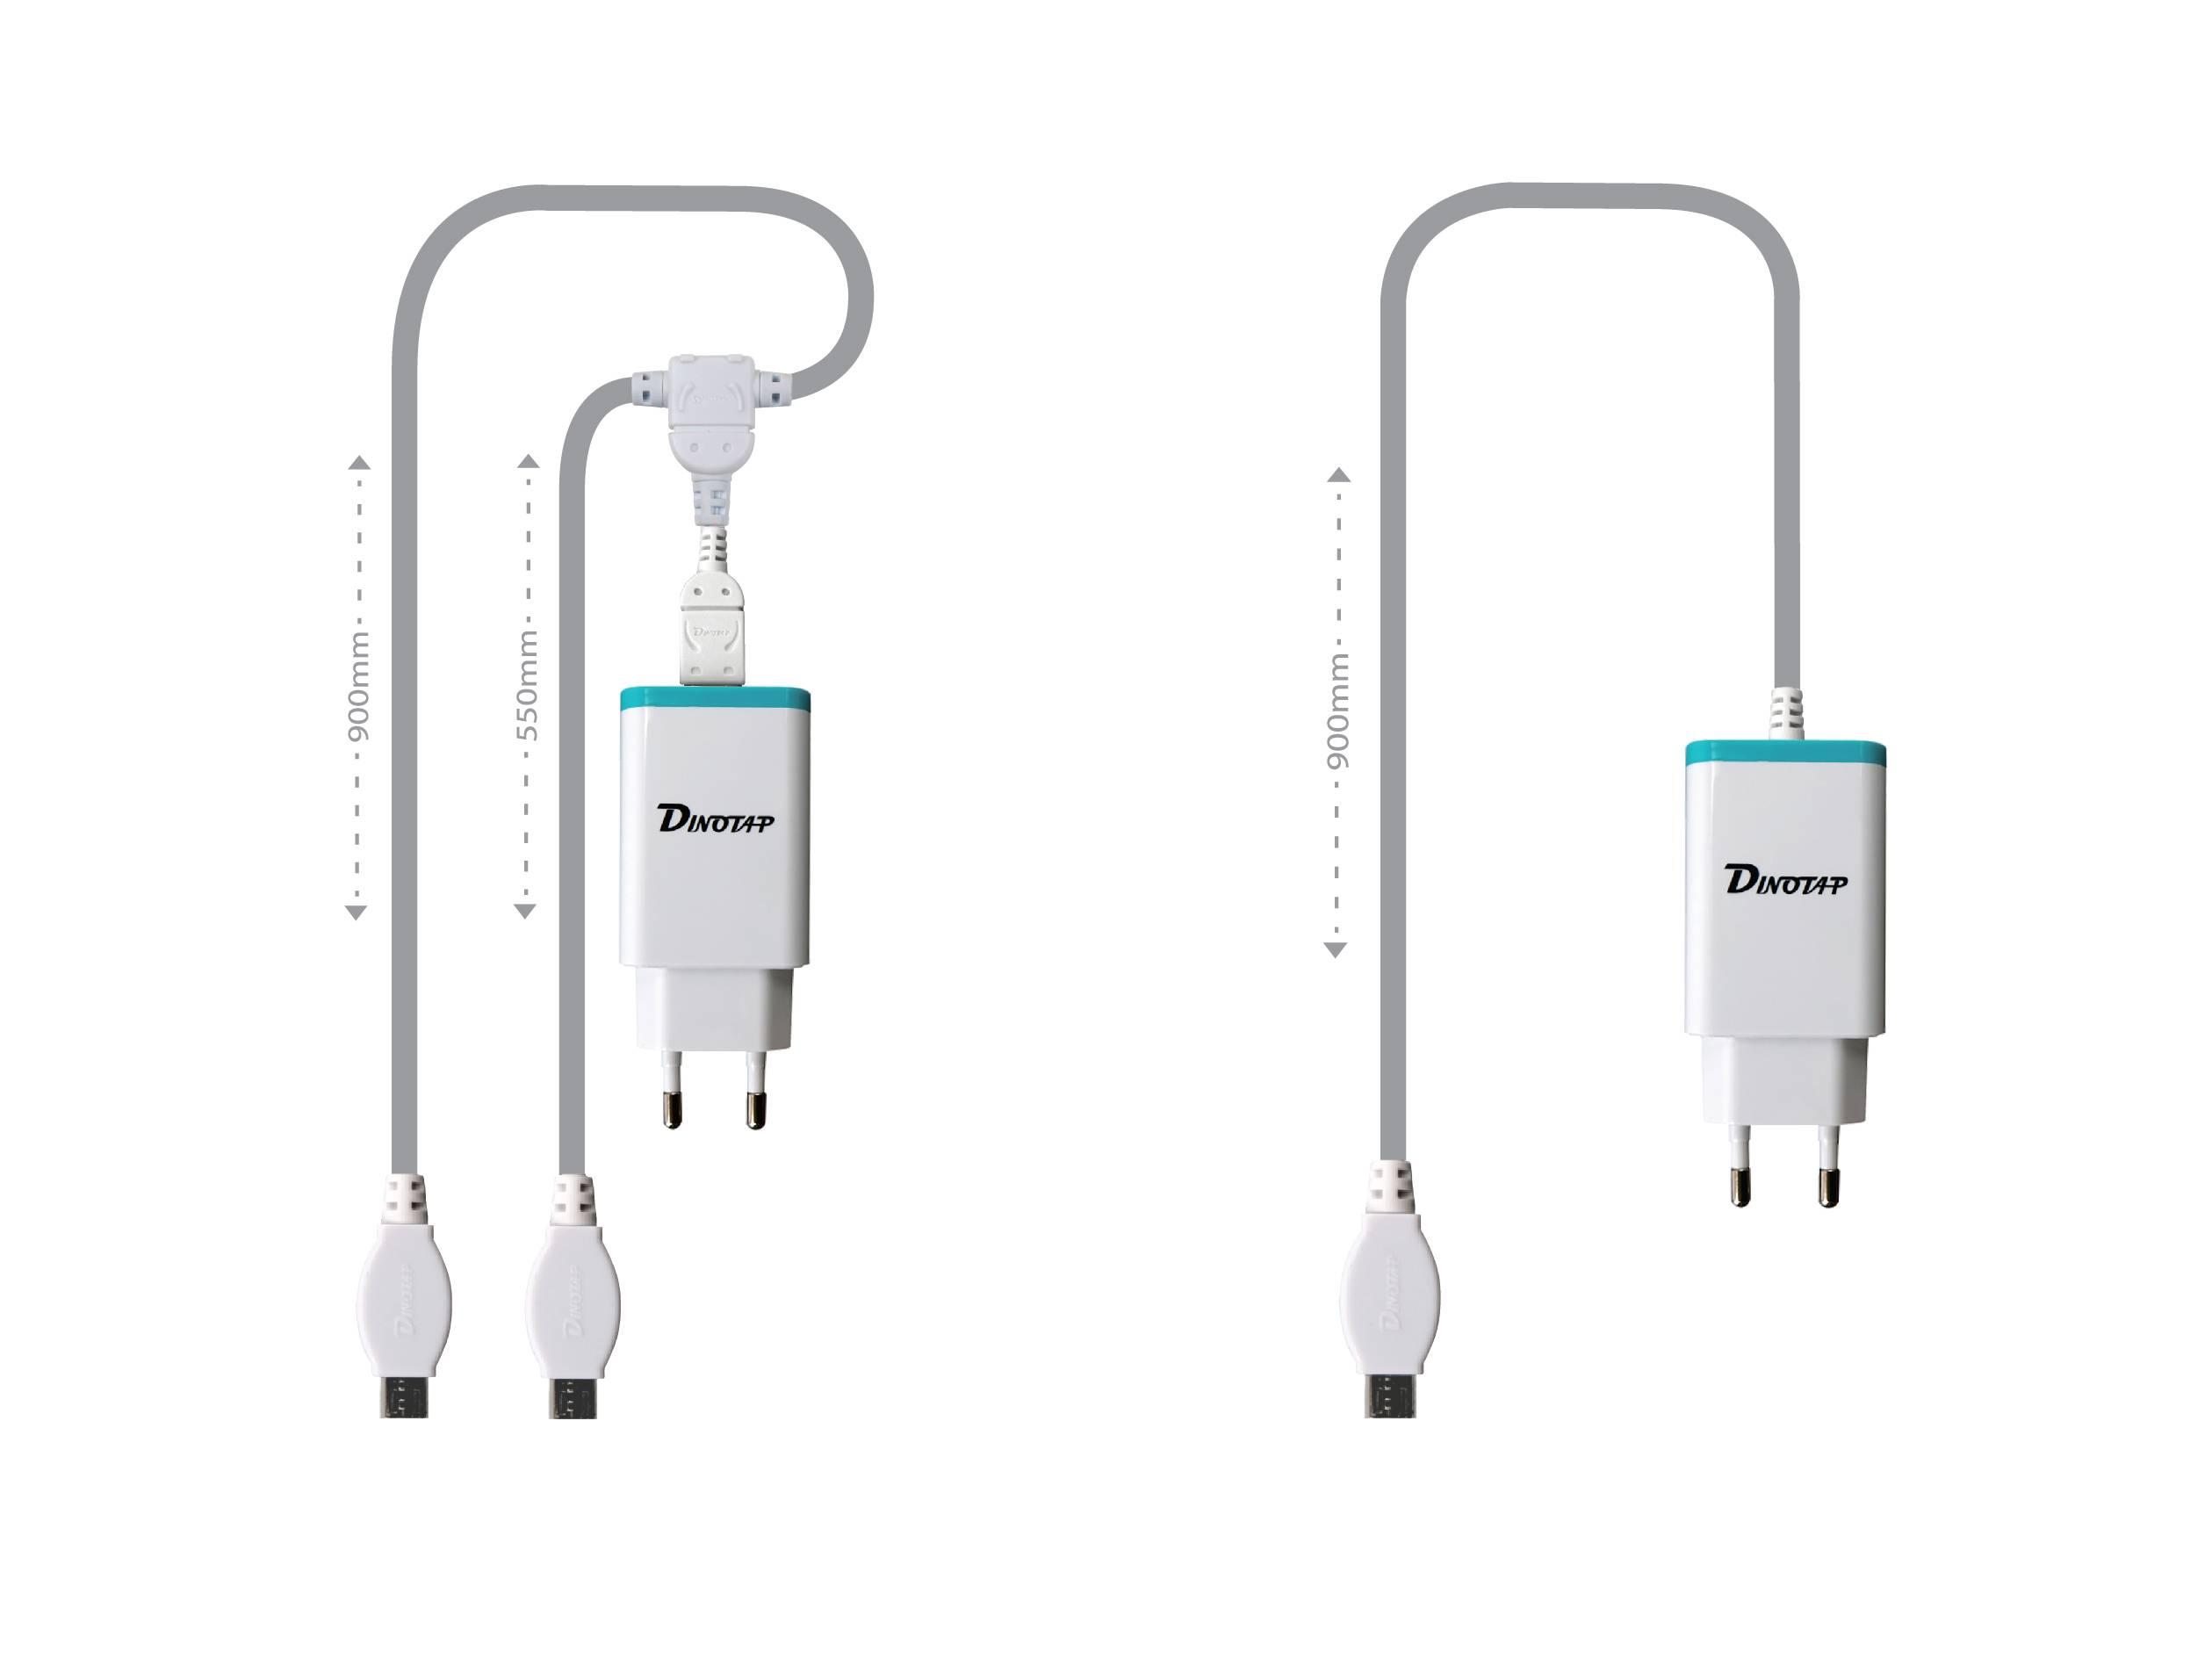 DINOTAP USB Detachable Dual Micro 5-PIN Multi-charger for household KSA-2000